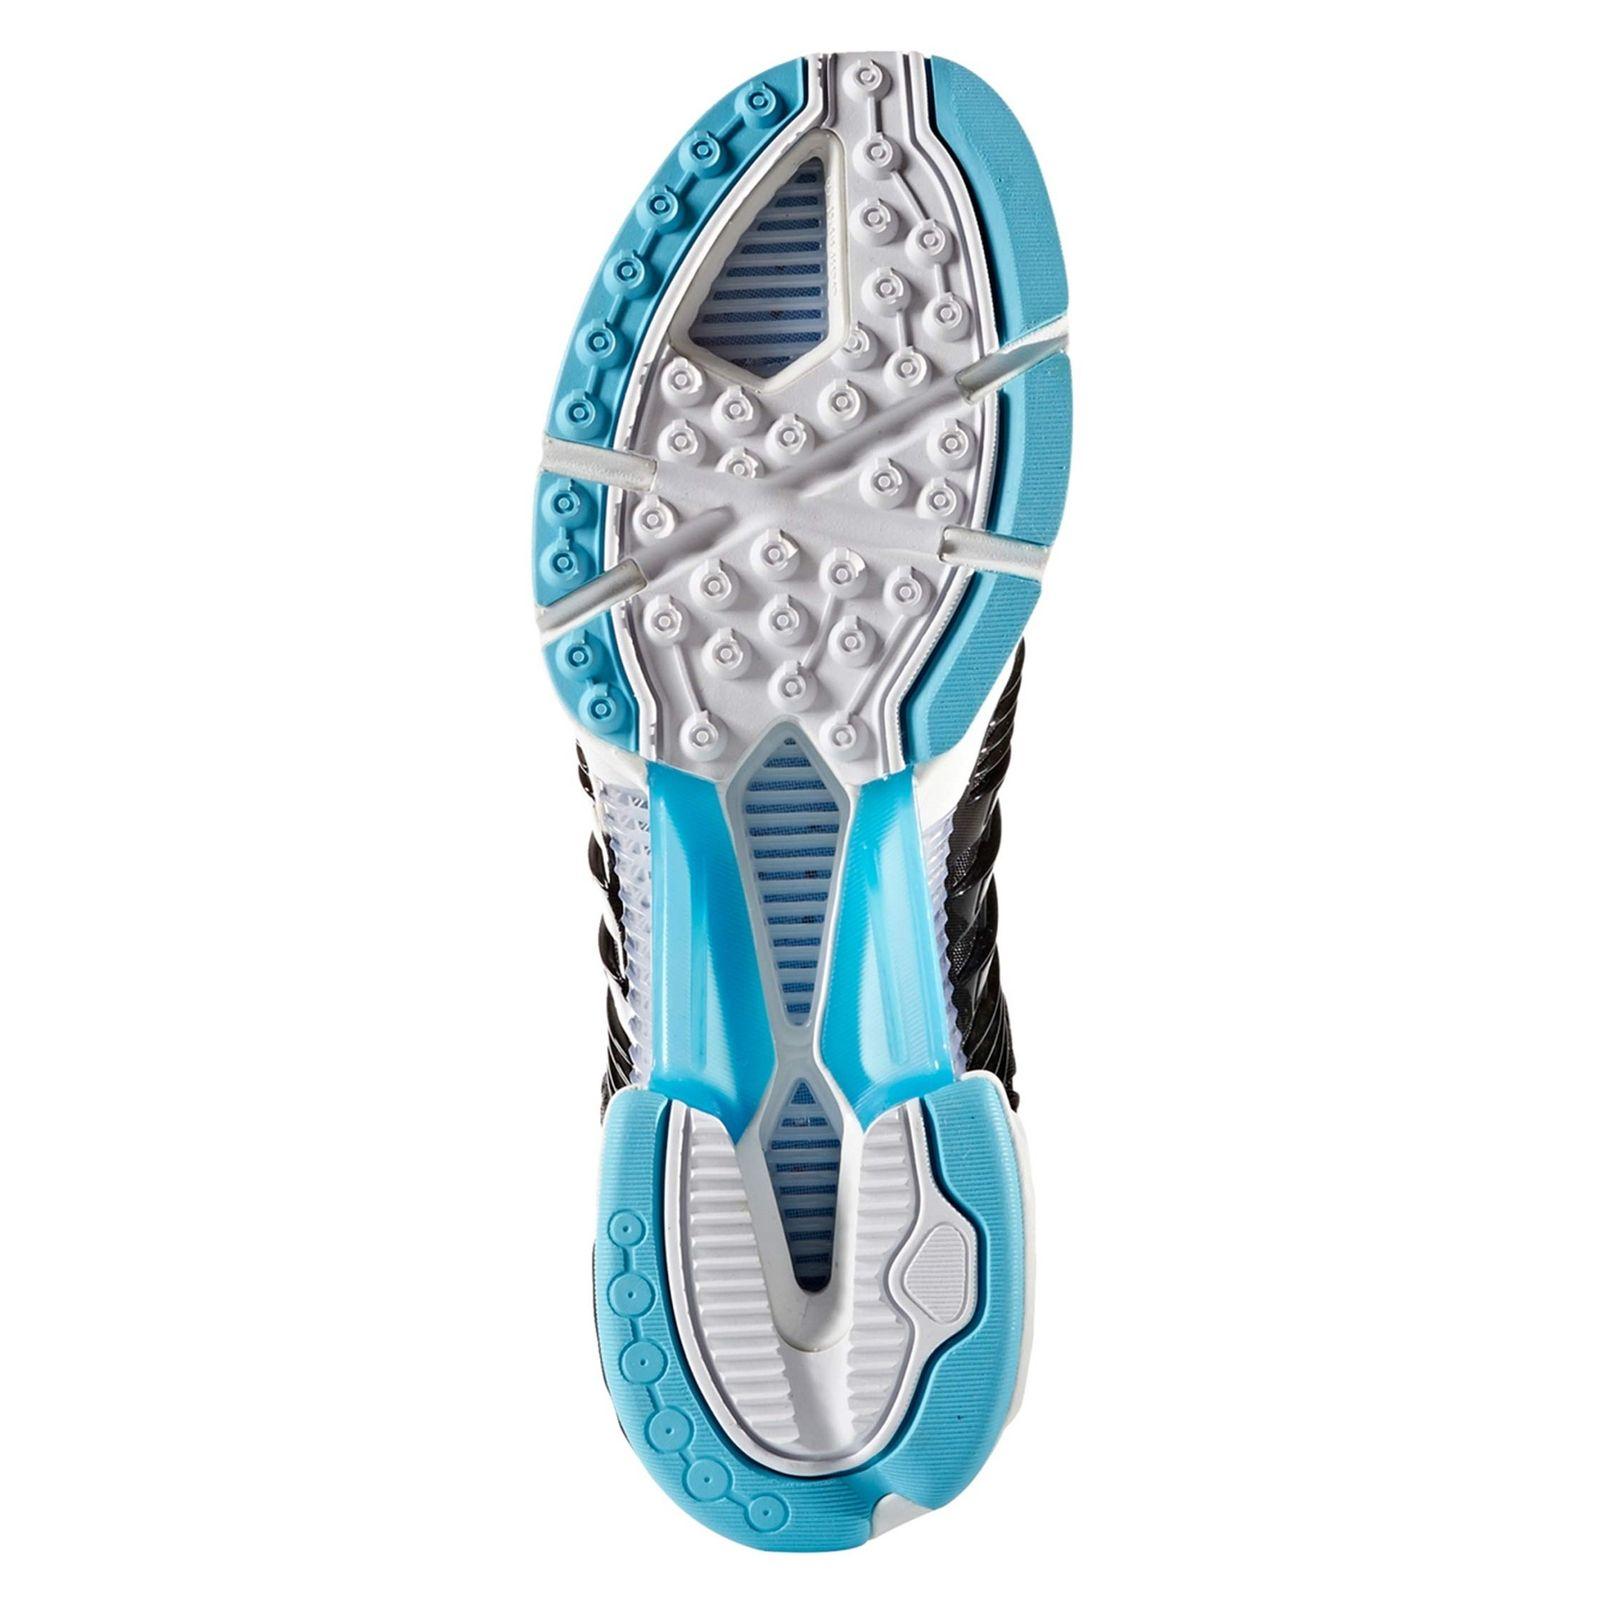 کفش پیاده روی بندی مردانه Climacool 1 - آدیداس - مشکی - 2